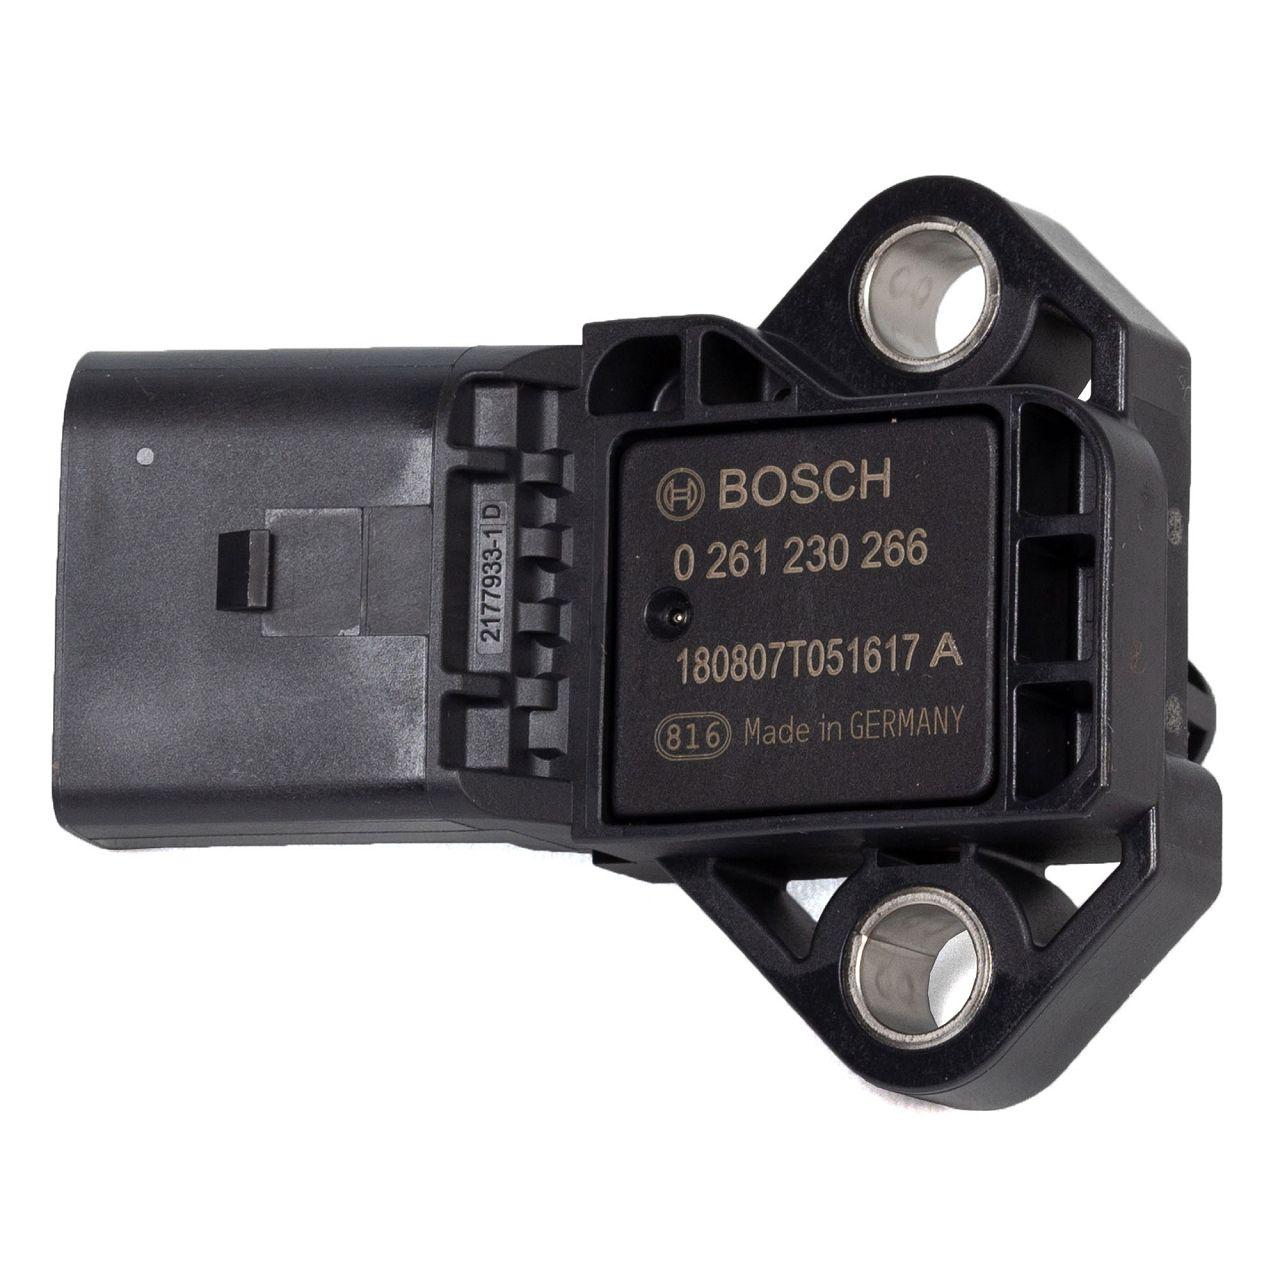 BOSCH 0261230266 Sensor Ladedruck AUDI A1 A3 A4 A6 SEAT Leon SKODA VW Golf 5 6